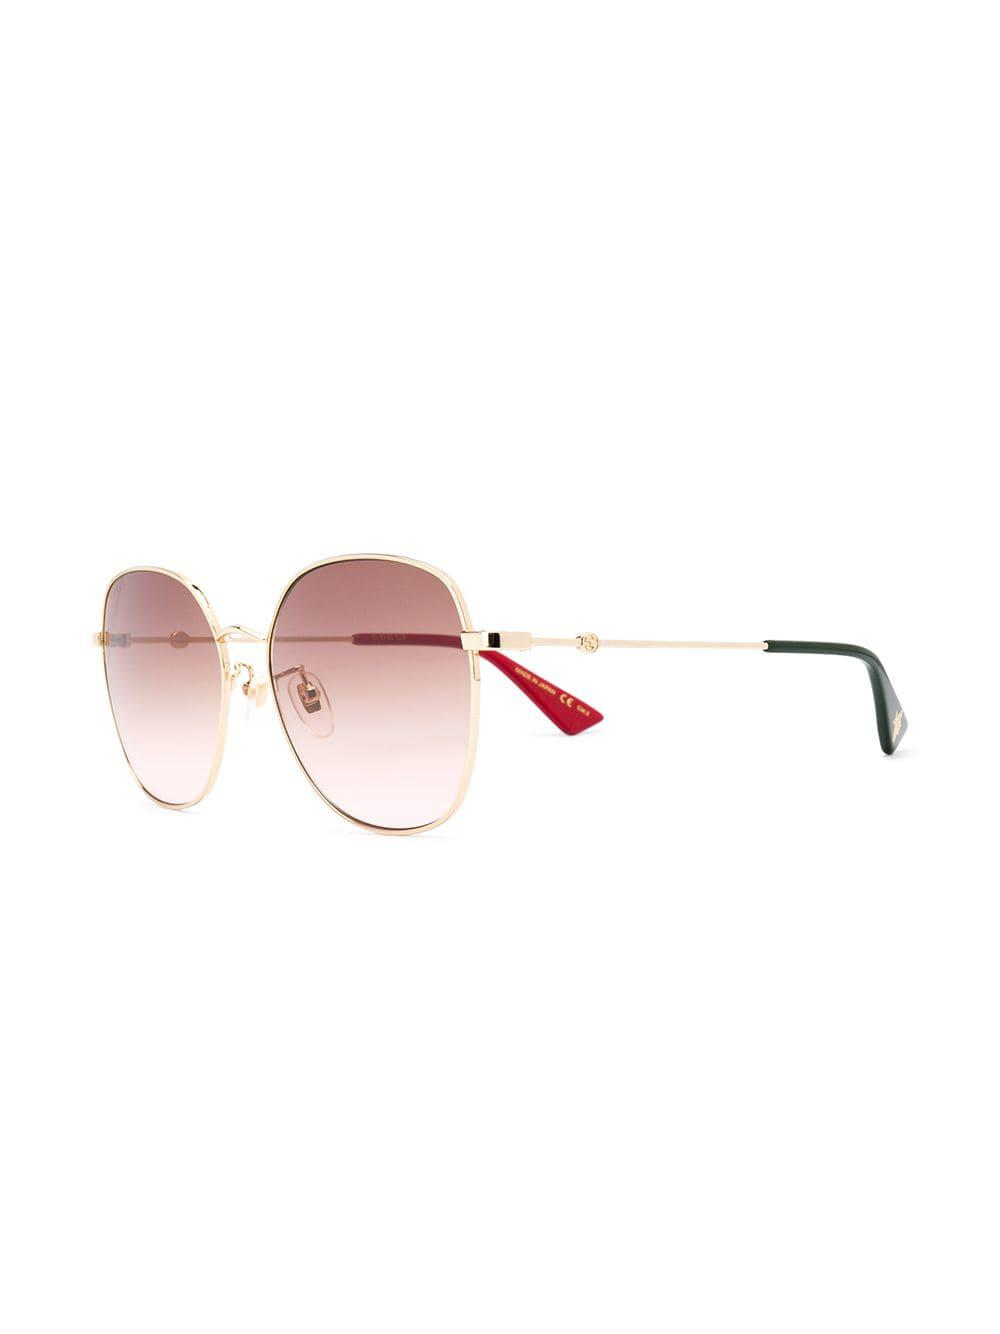 1d036fcb641 Gucci Square Frame Sunglasses in Metallic - Lyst